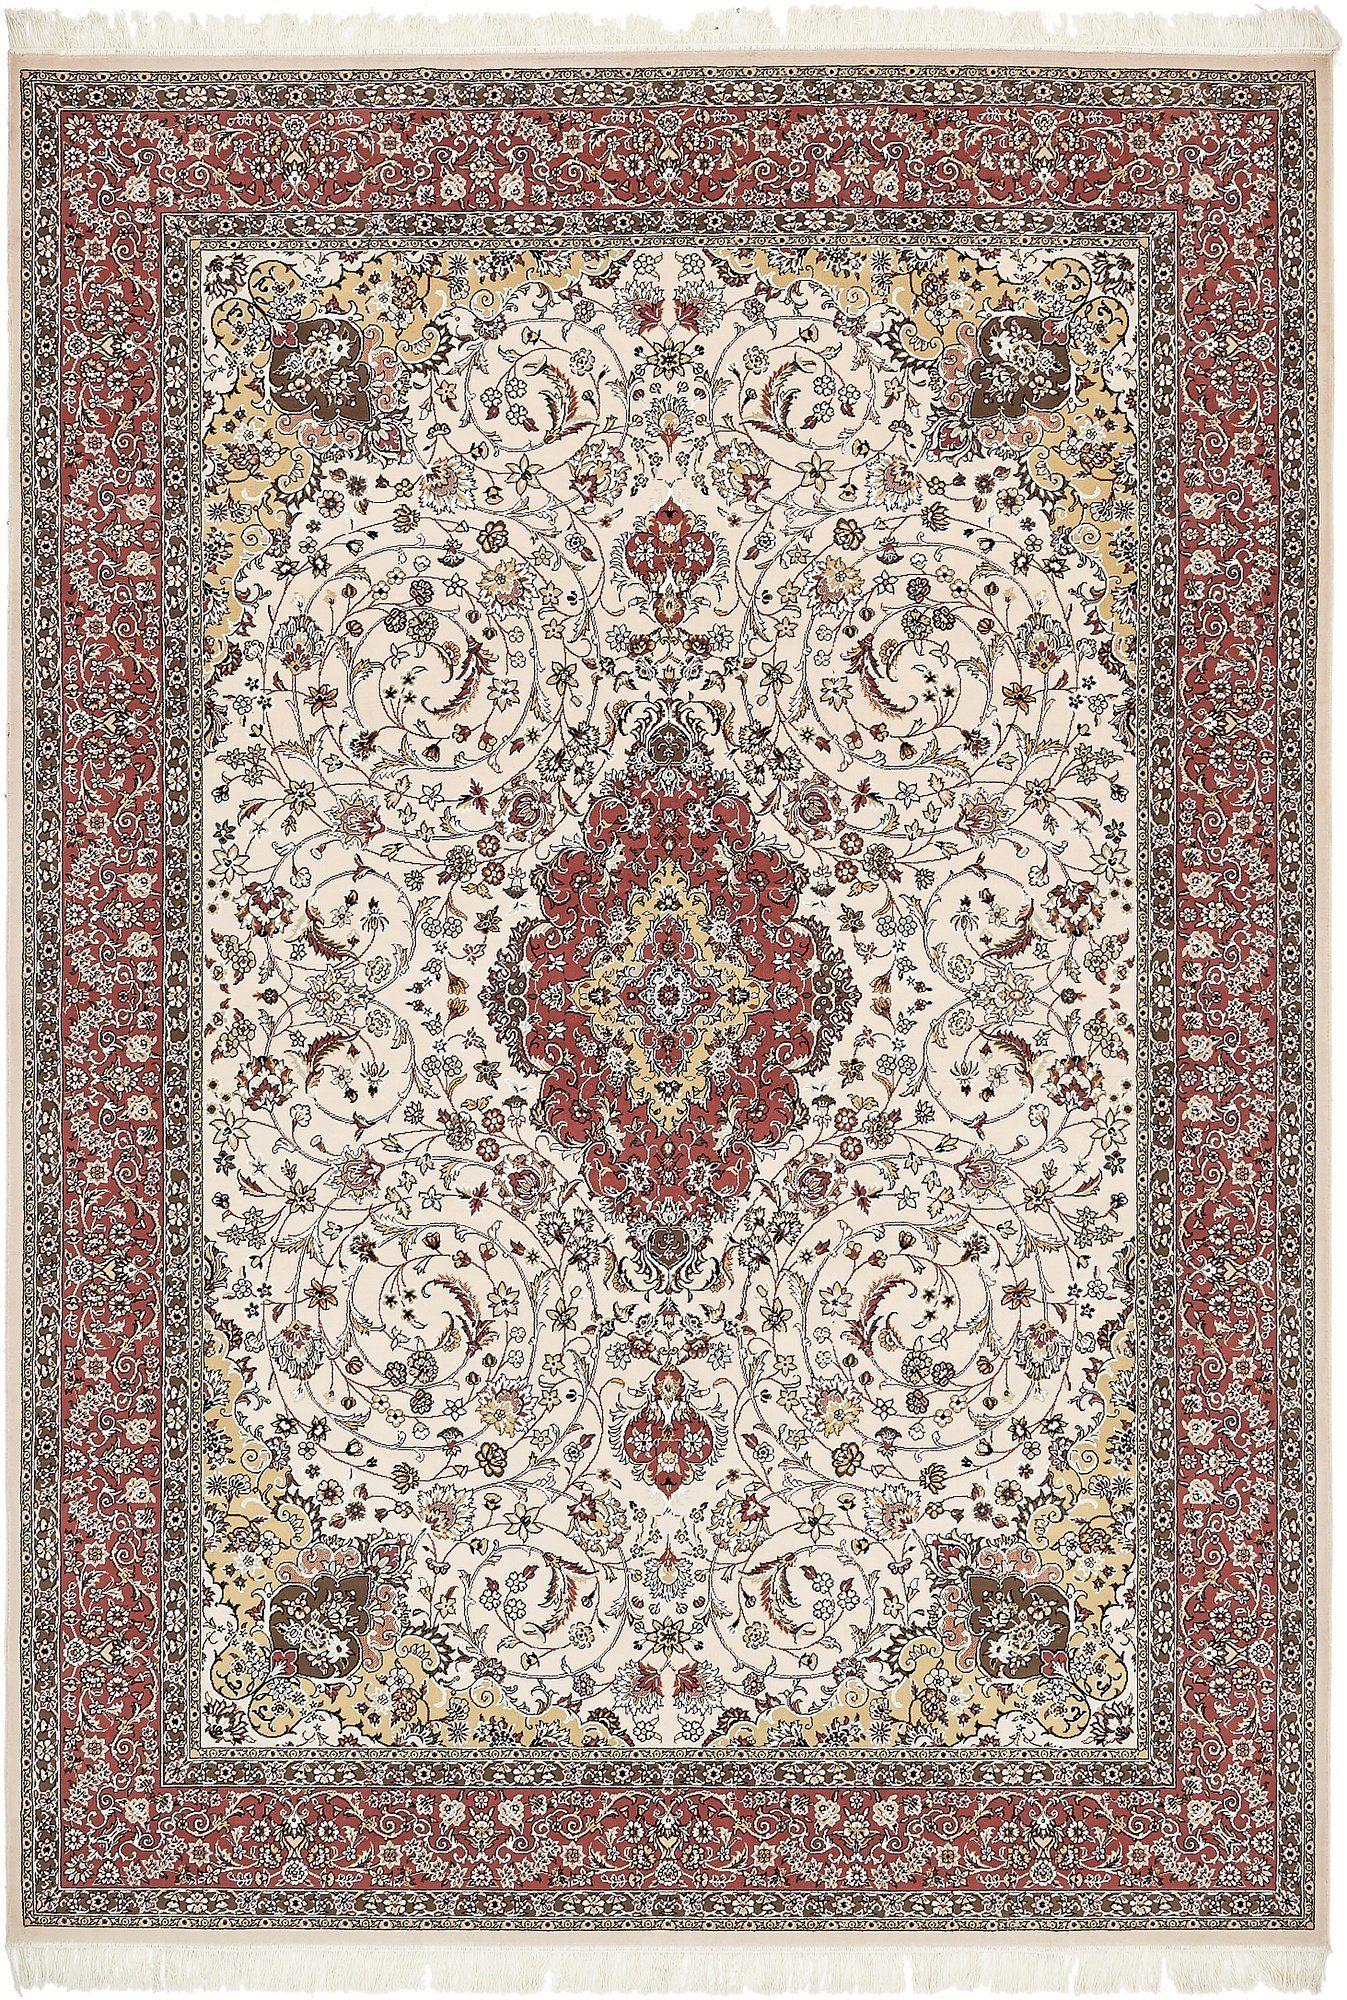 Brown Lori Vintage Area Rug Handmade Wool Oriental Dining Room Carpet 8x12 8 5 X 12 3 Vintage Area Rugs Handmade Area Rugs Handmade Rugs